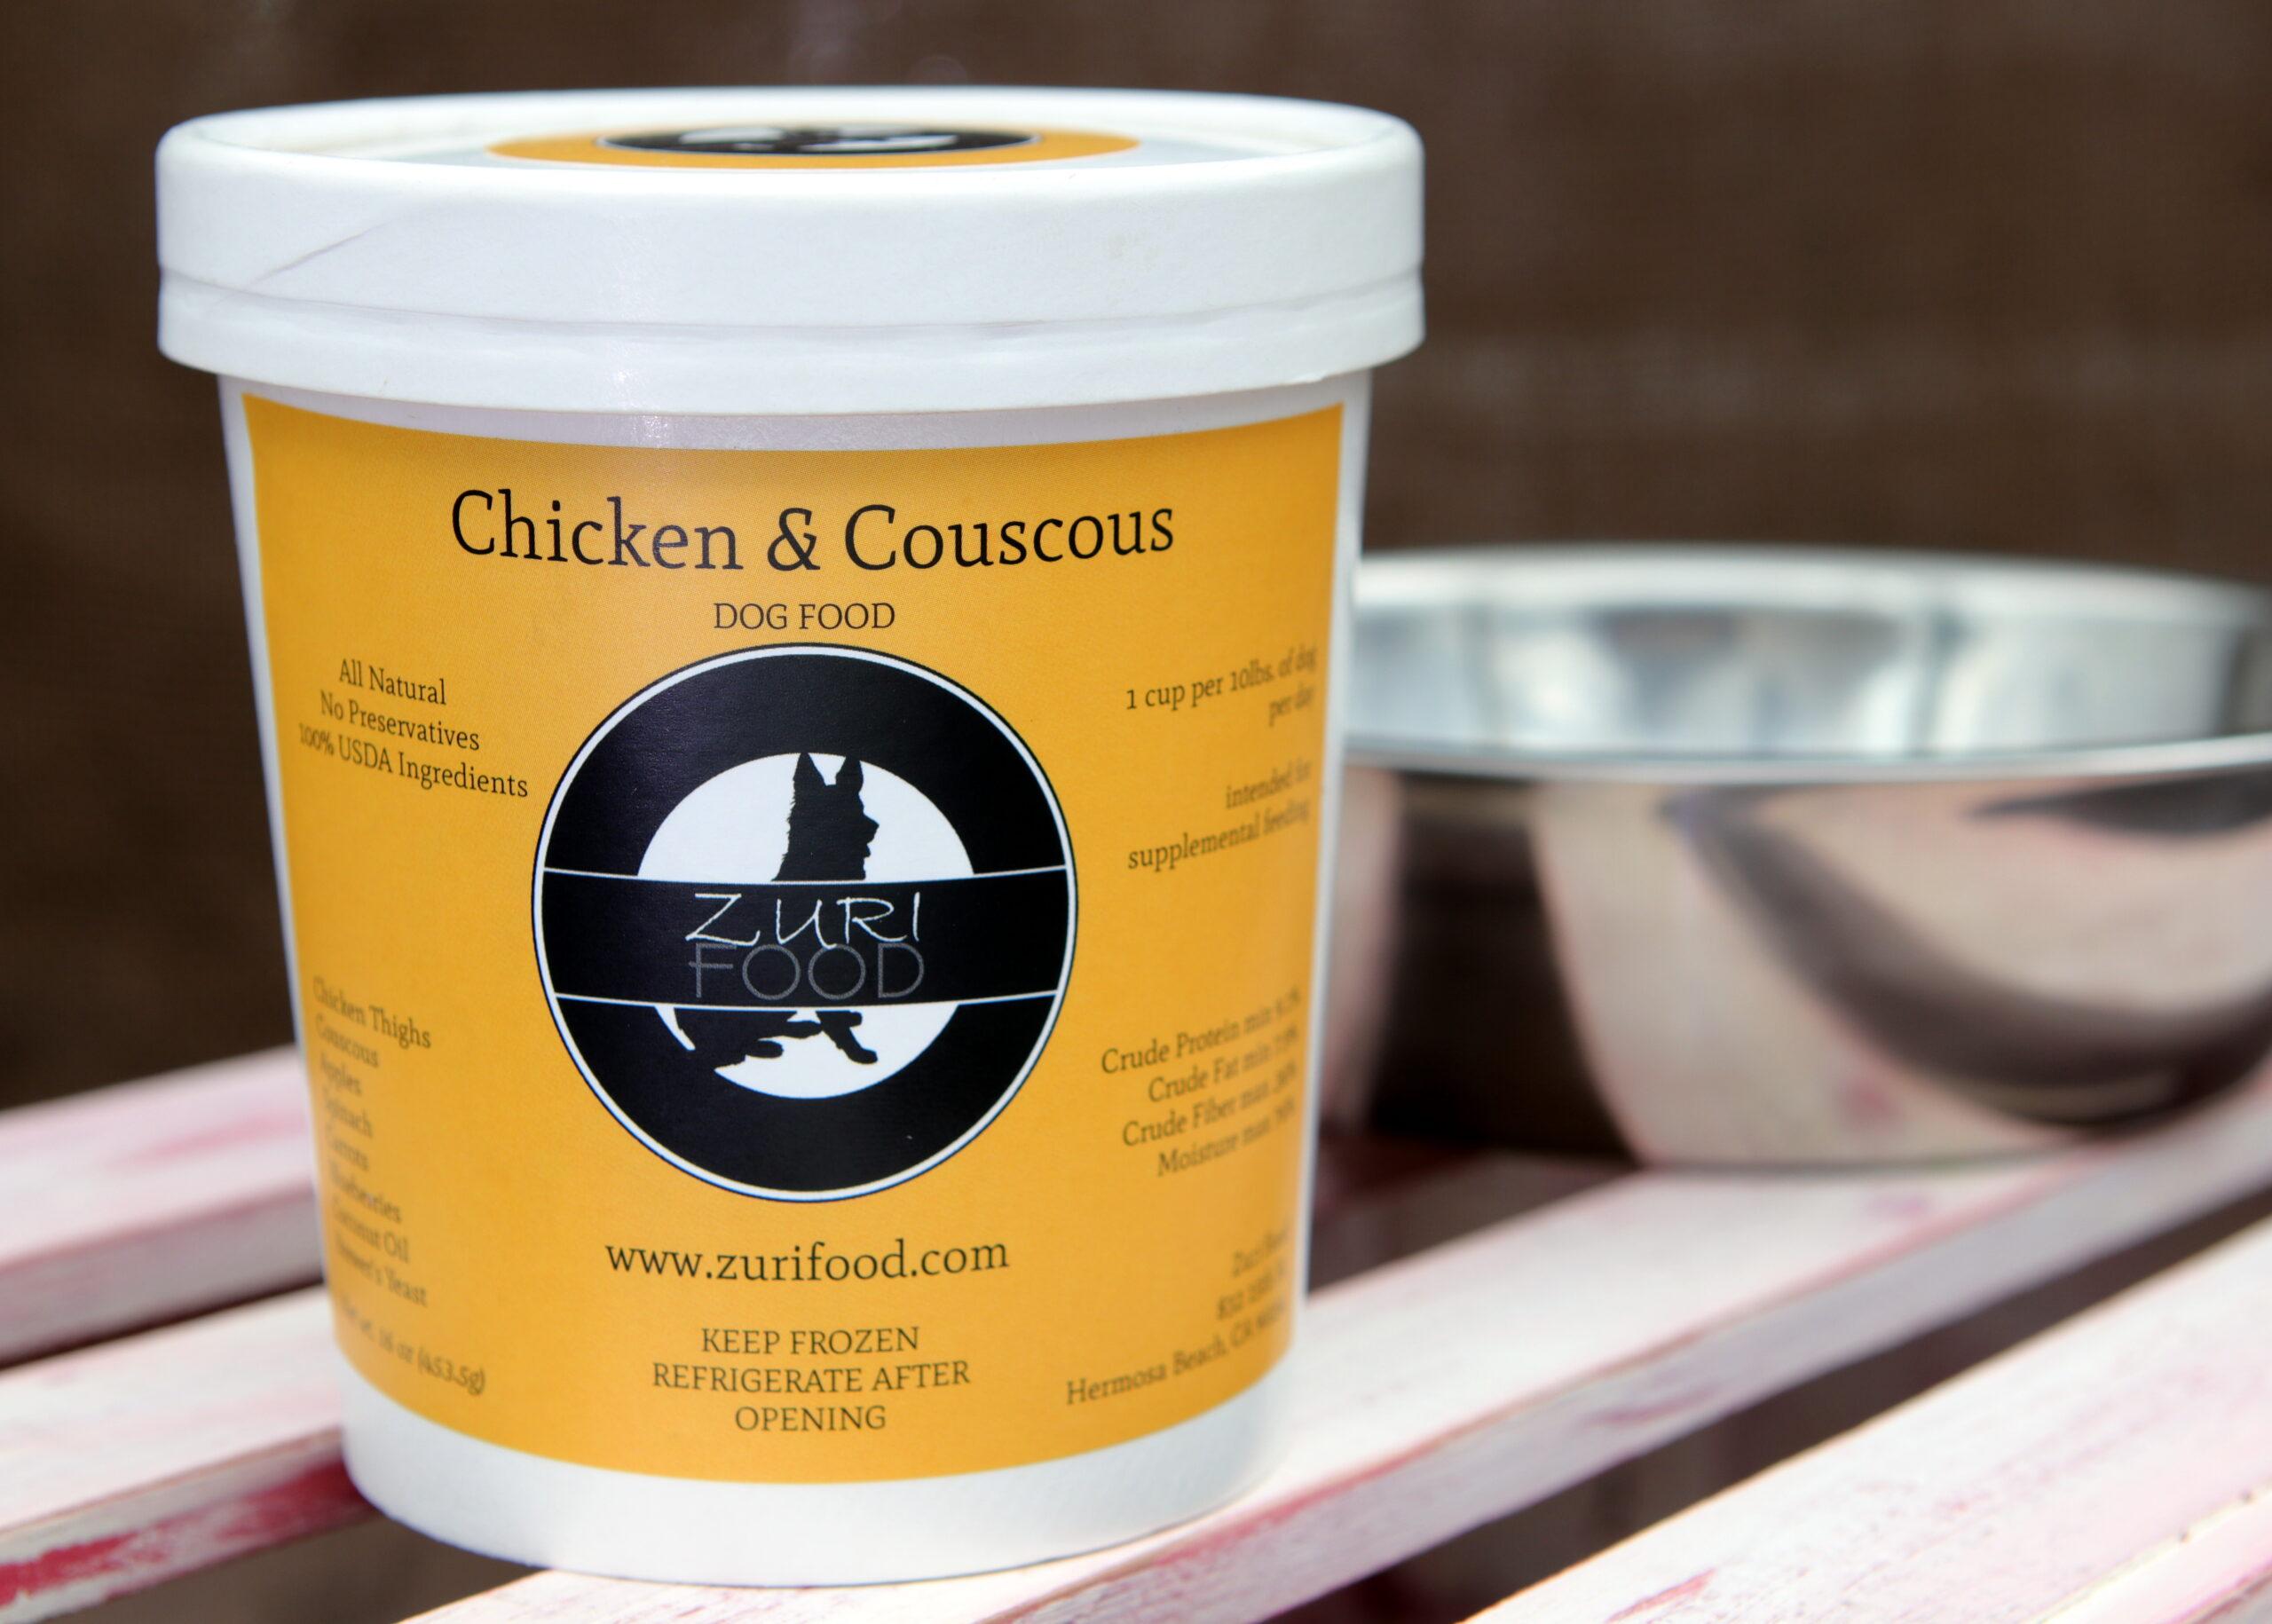 Chicken & Couscous